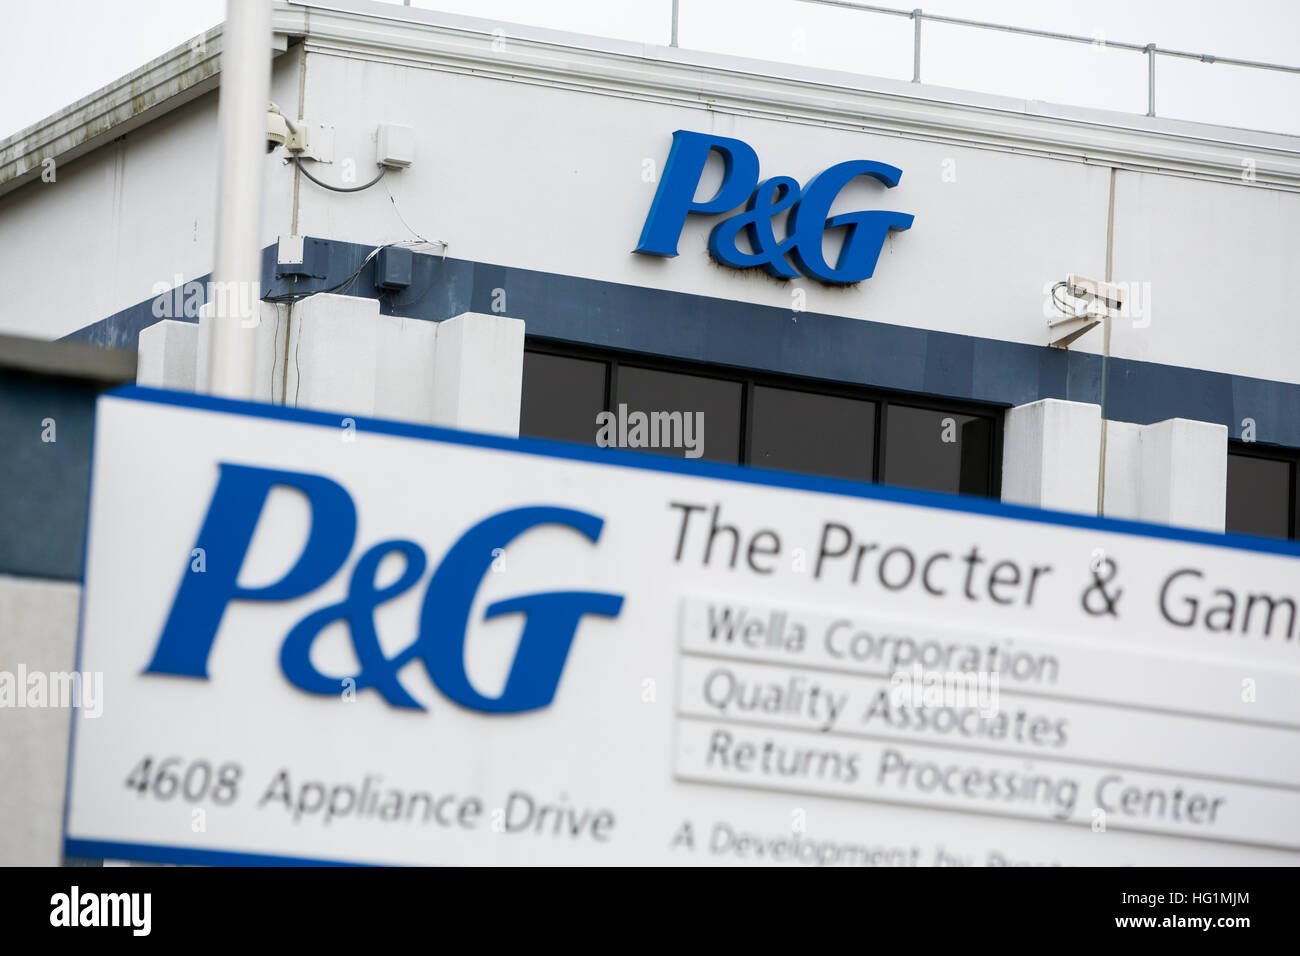 Procter And Gamble Logo Stockfotos Procter And Gamble Logo Bilder